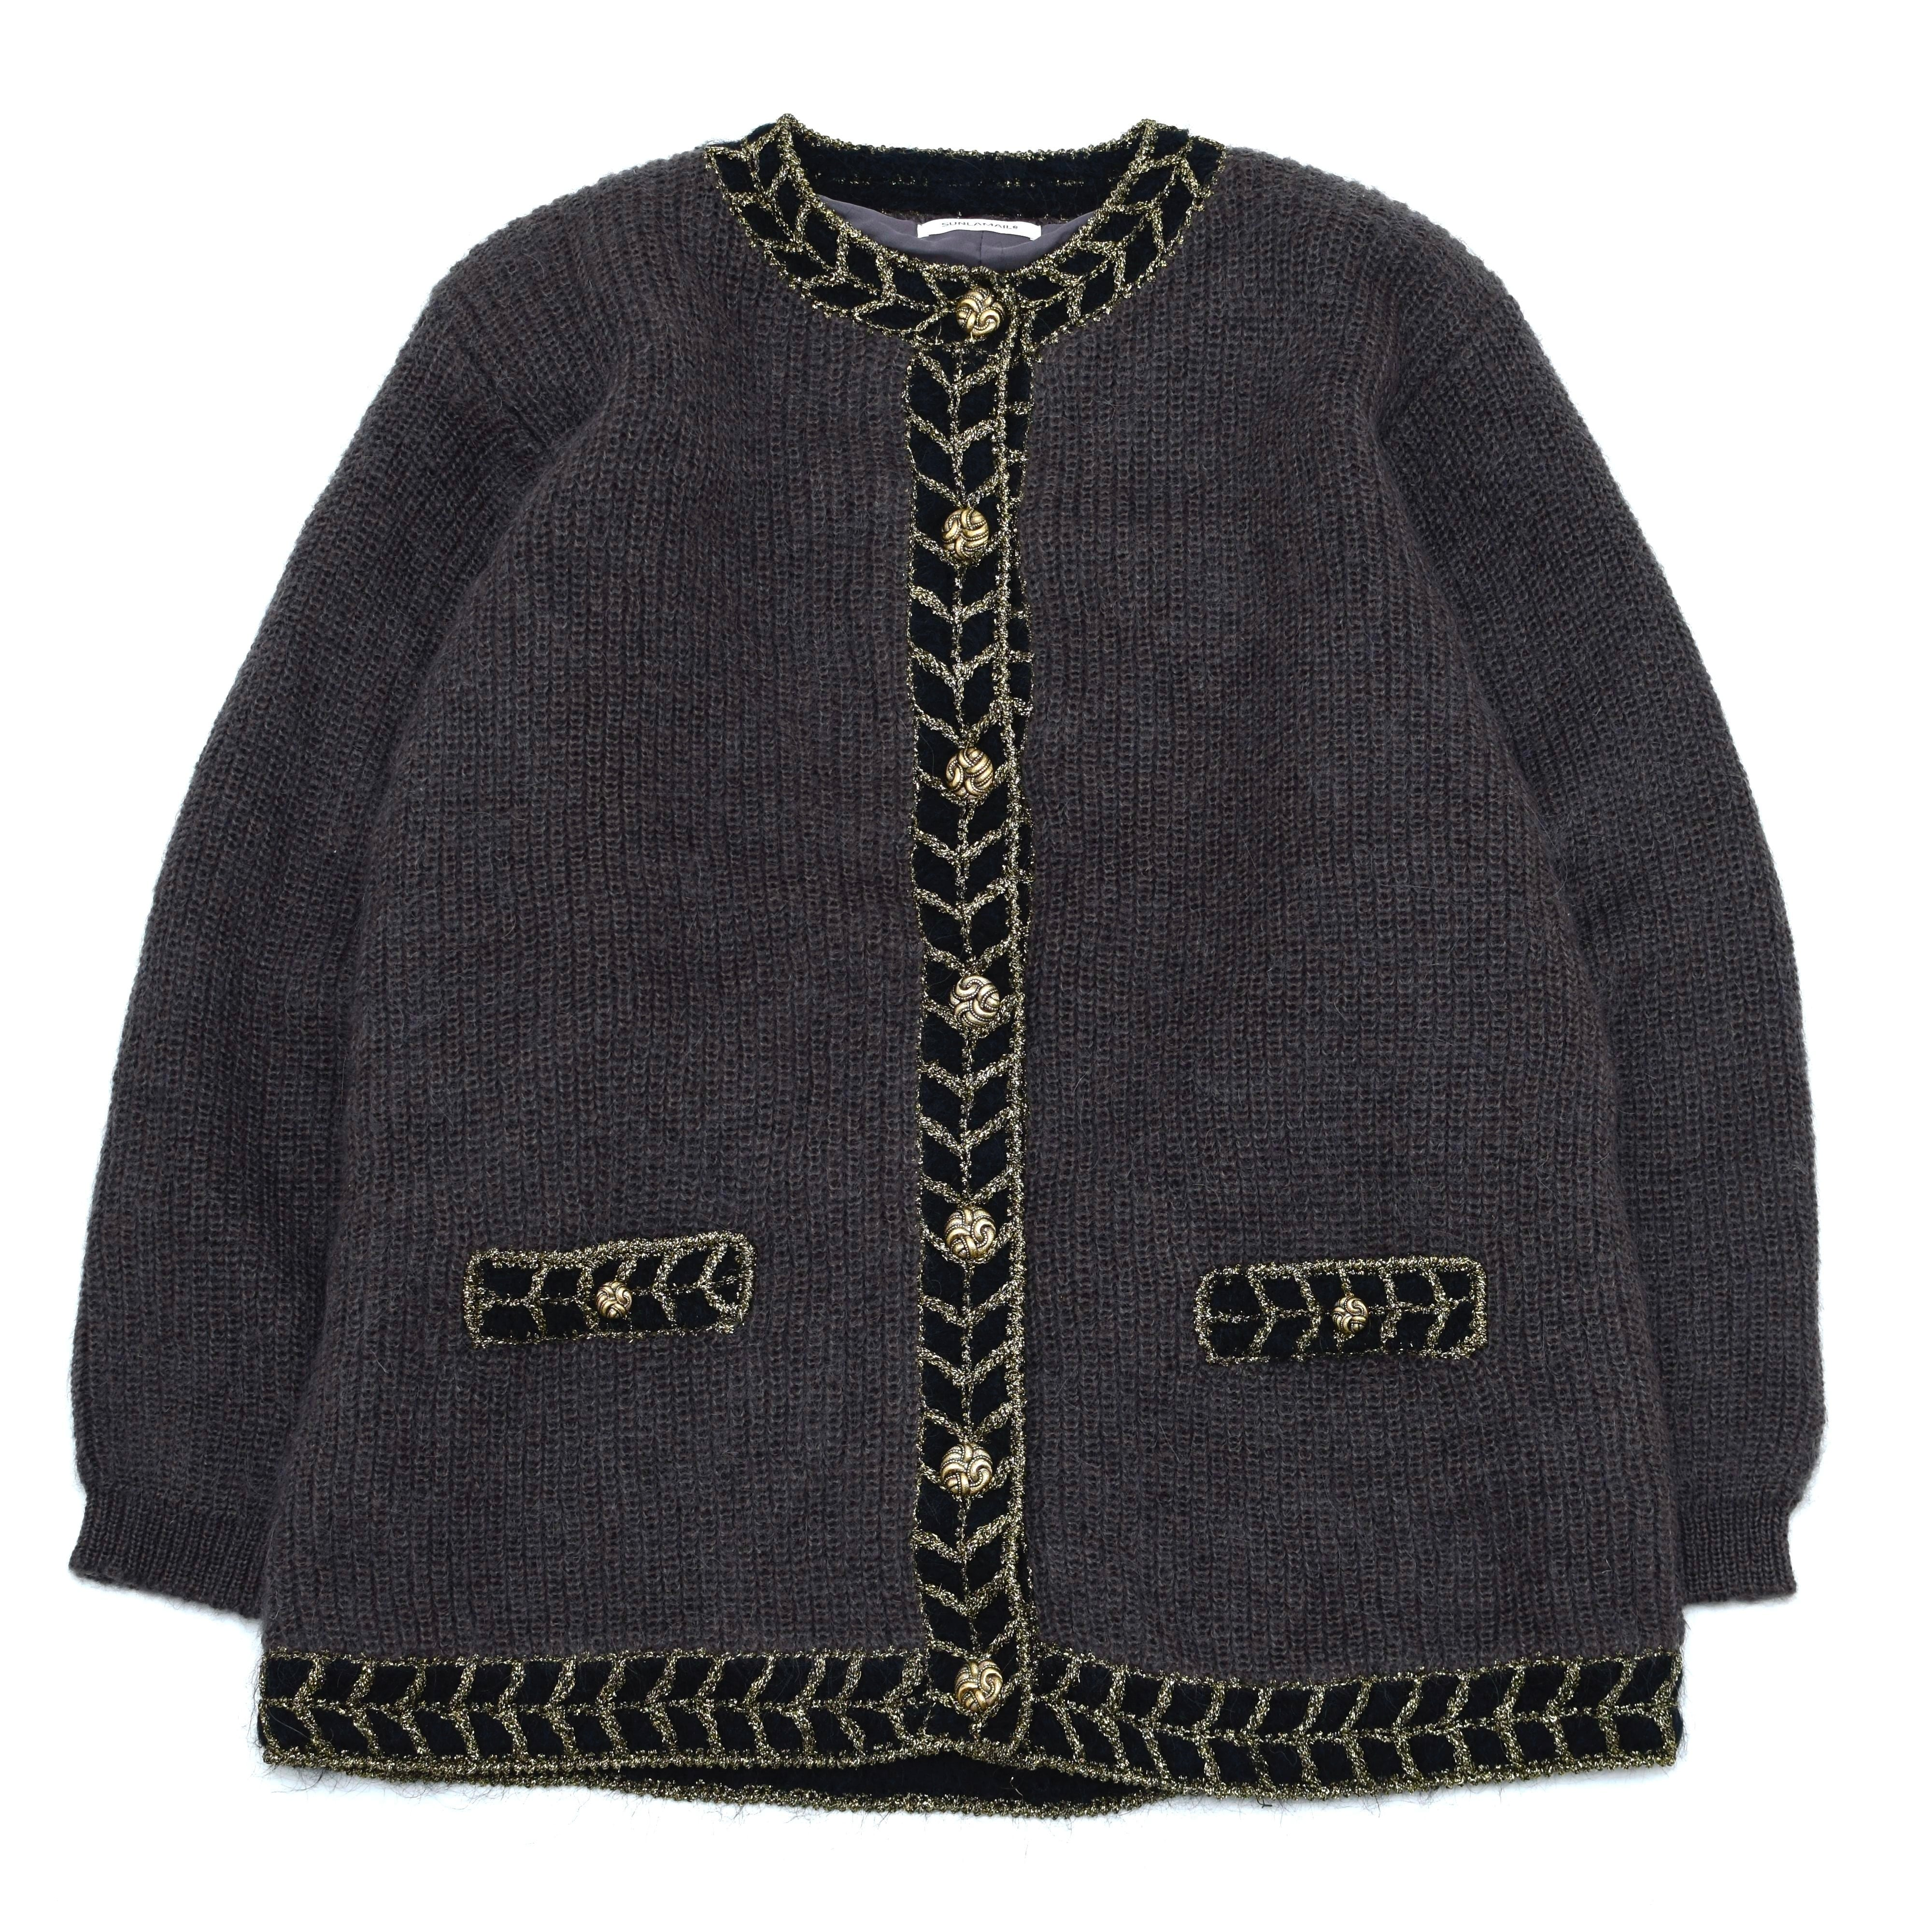 Luxury bicolor wool knit cardigan